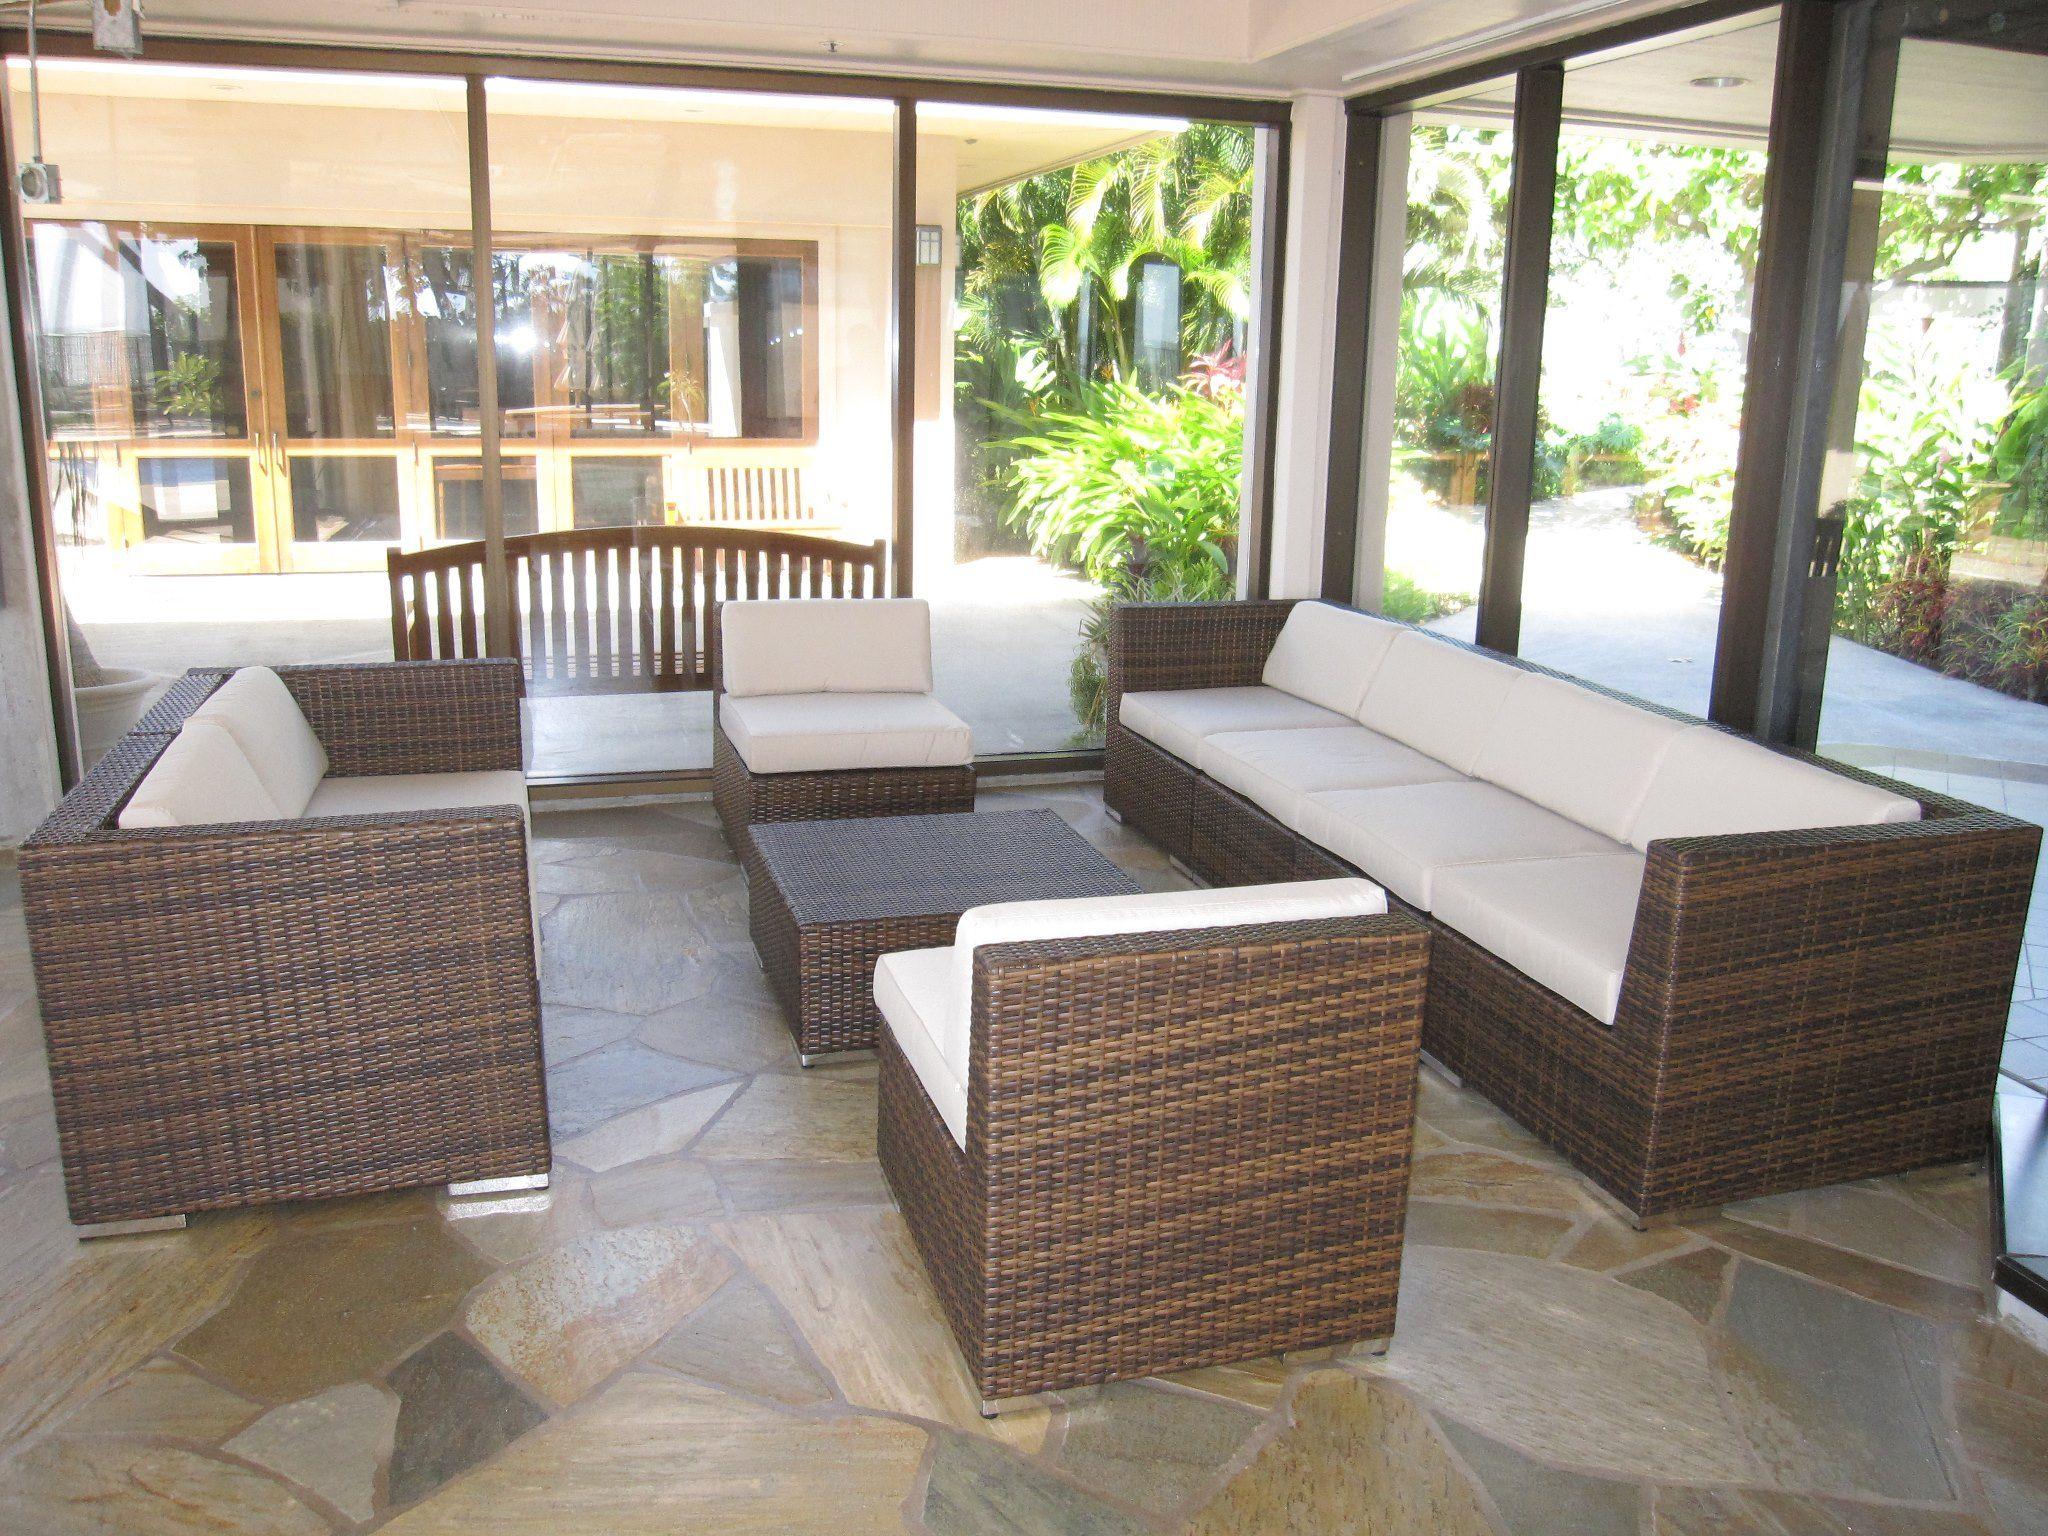 Ohana Wicker Furniture Outdoor Patio Deep